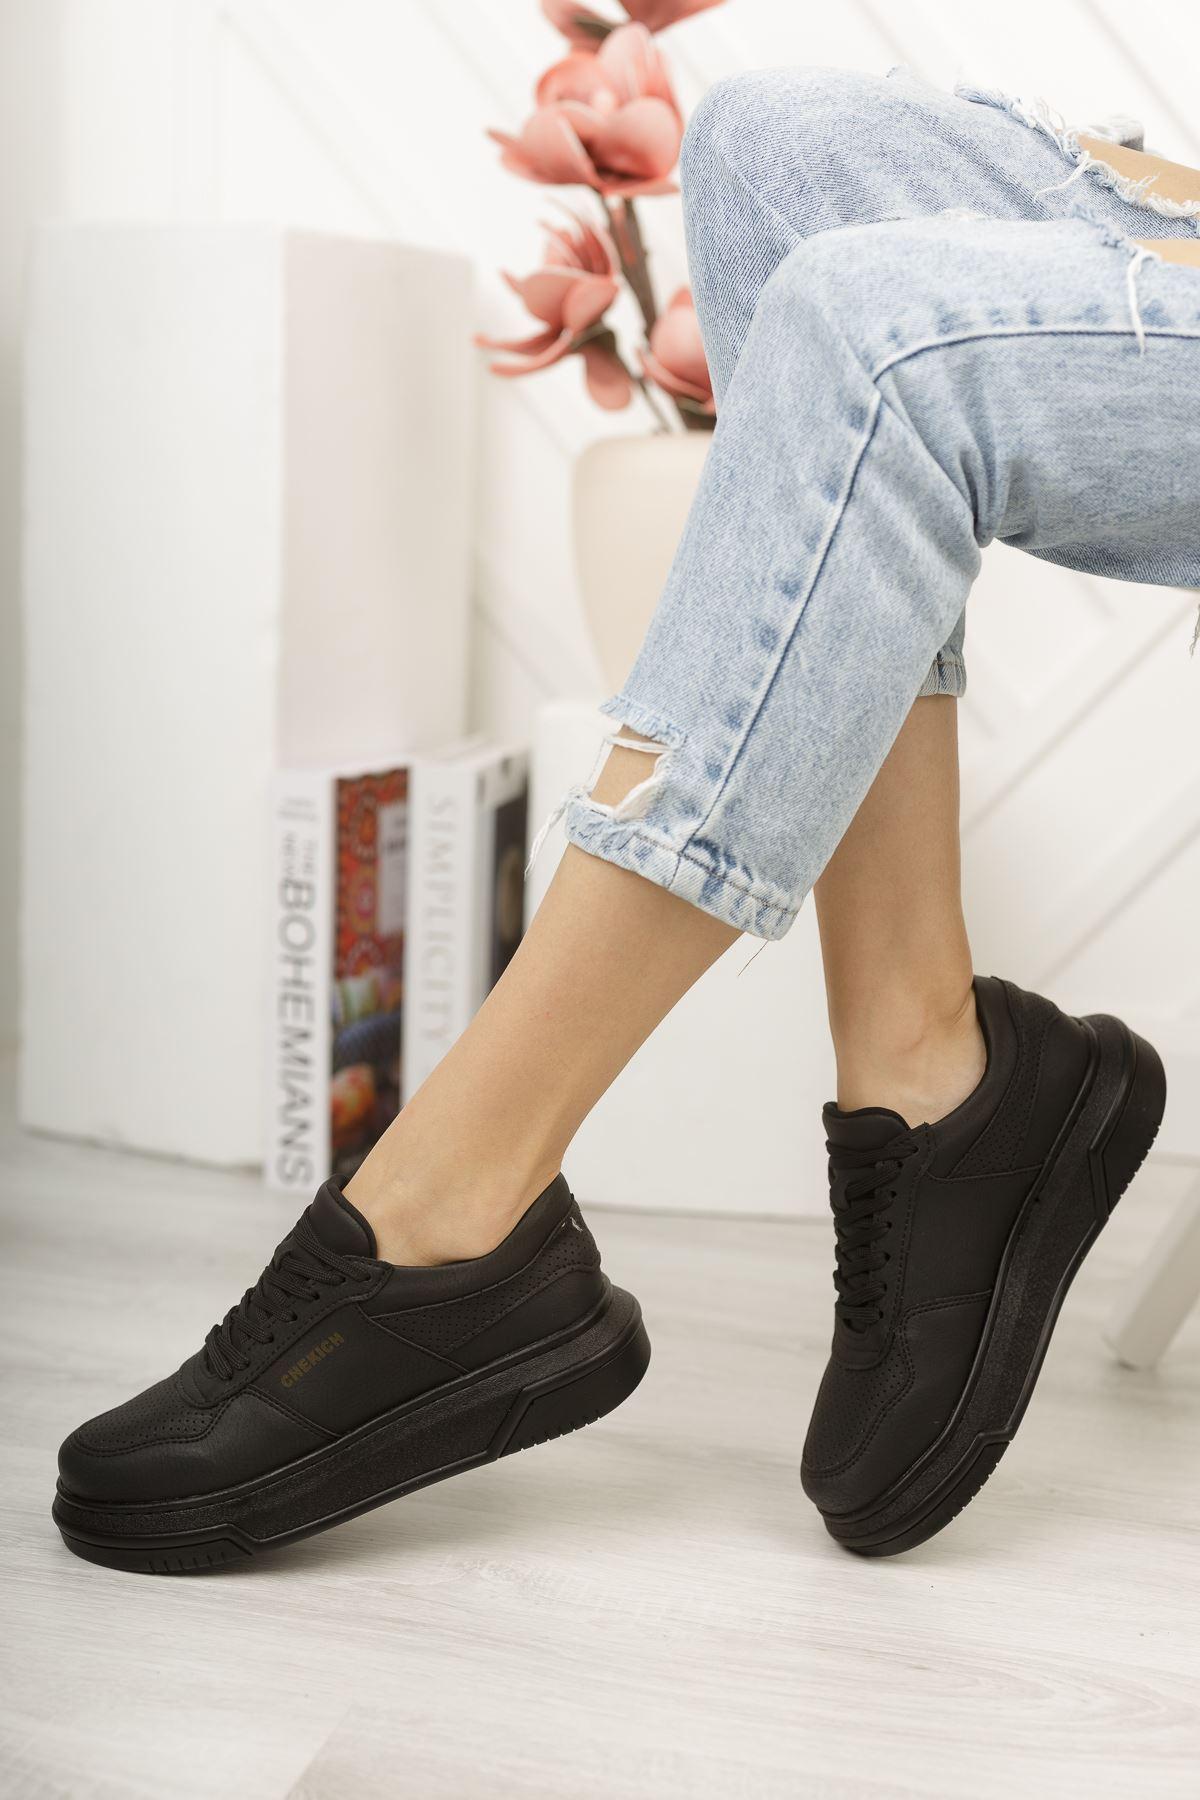 Chekich CH075 İpekyol ST Kadın Ayakkabı SIYAH